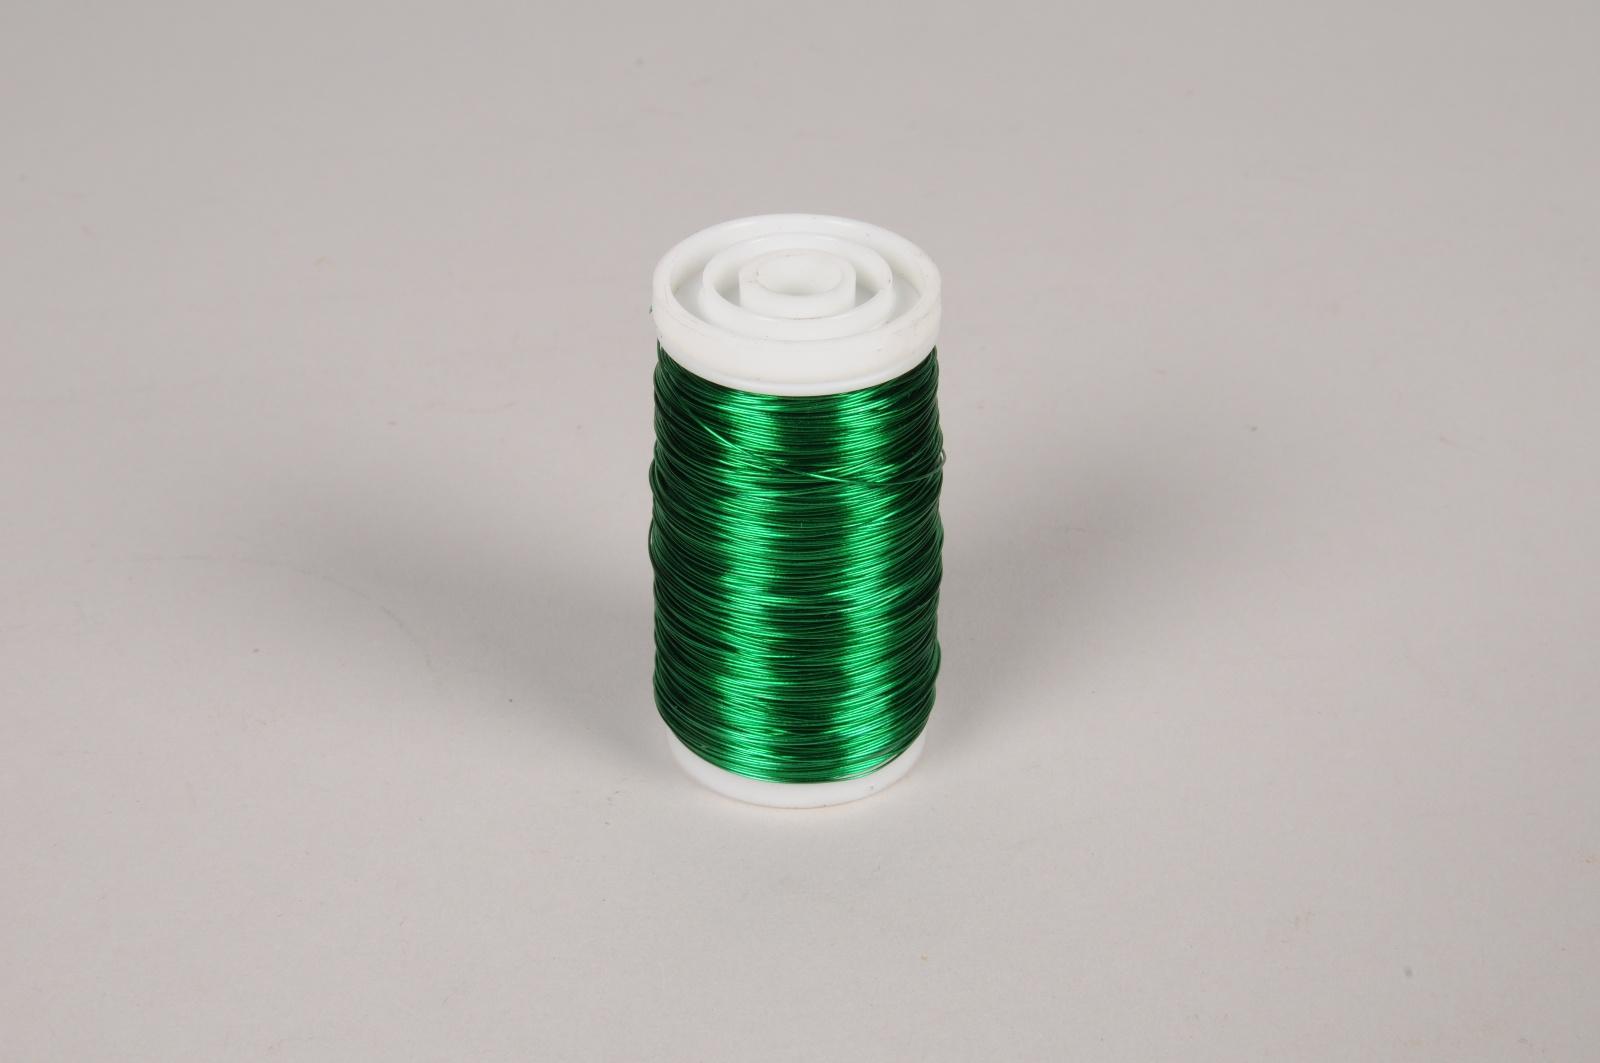 A459MG Rouleau de fil de fer vert 160m